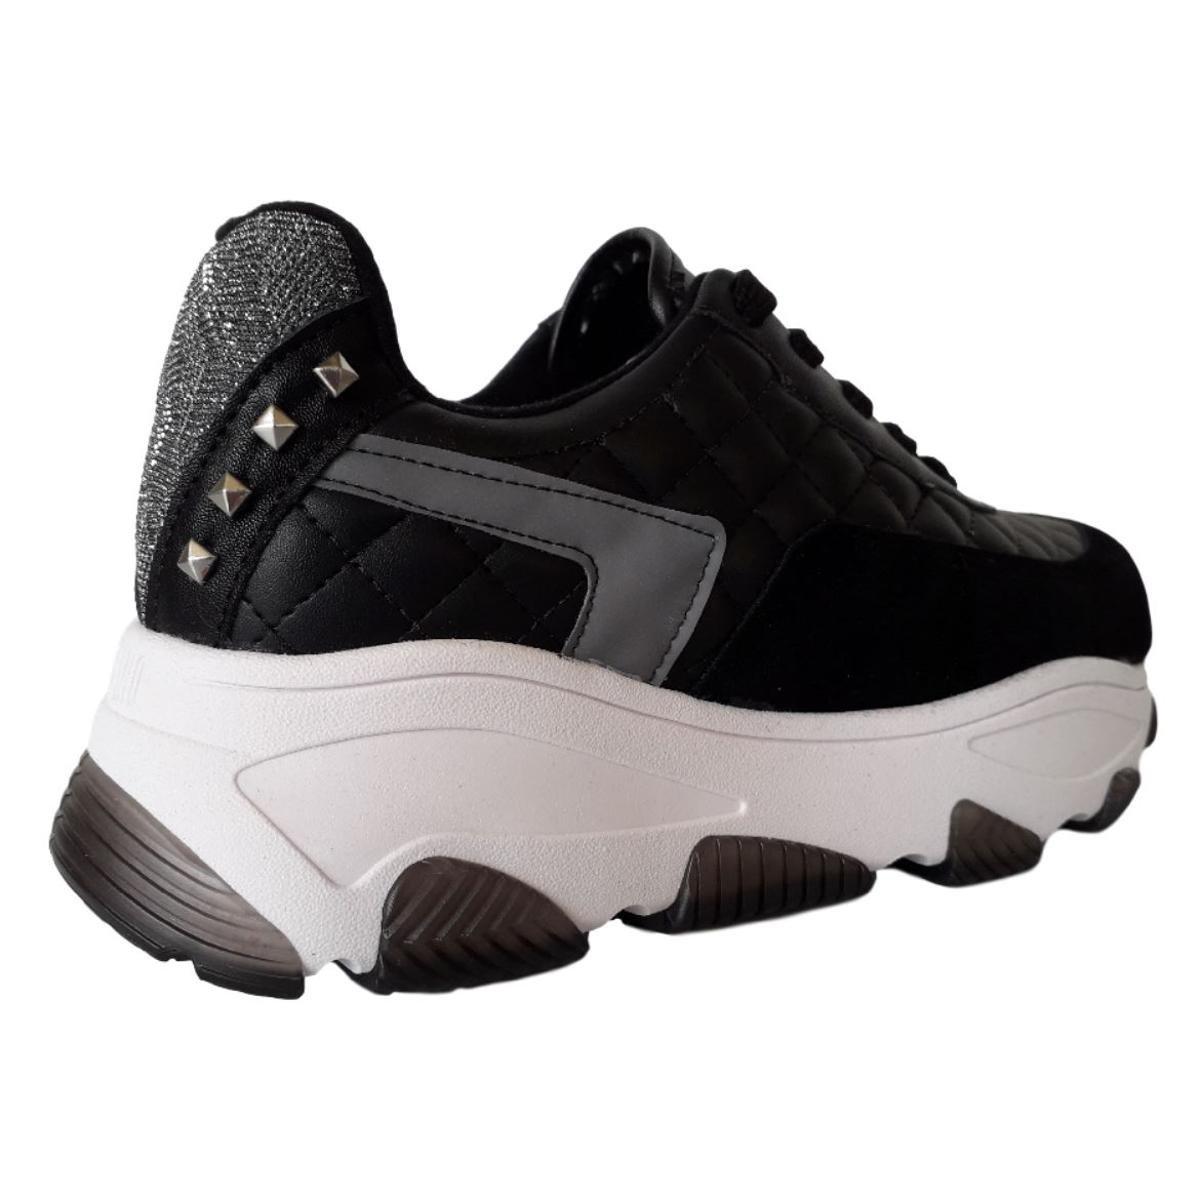 Tênis Chunky Vizzano Plataforma Sneaker Ugly Shoes - Preto